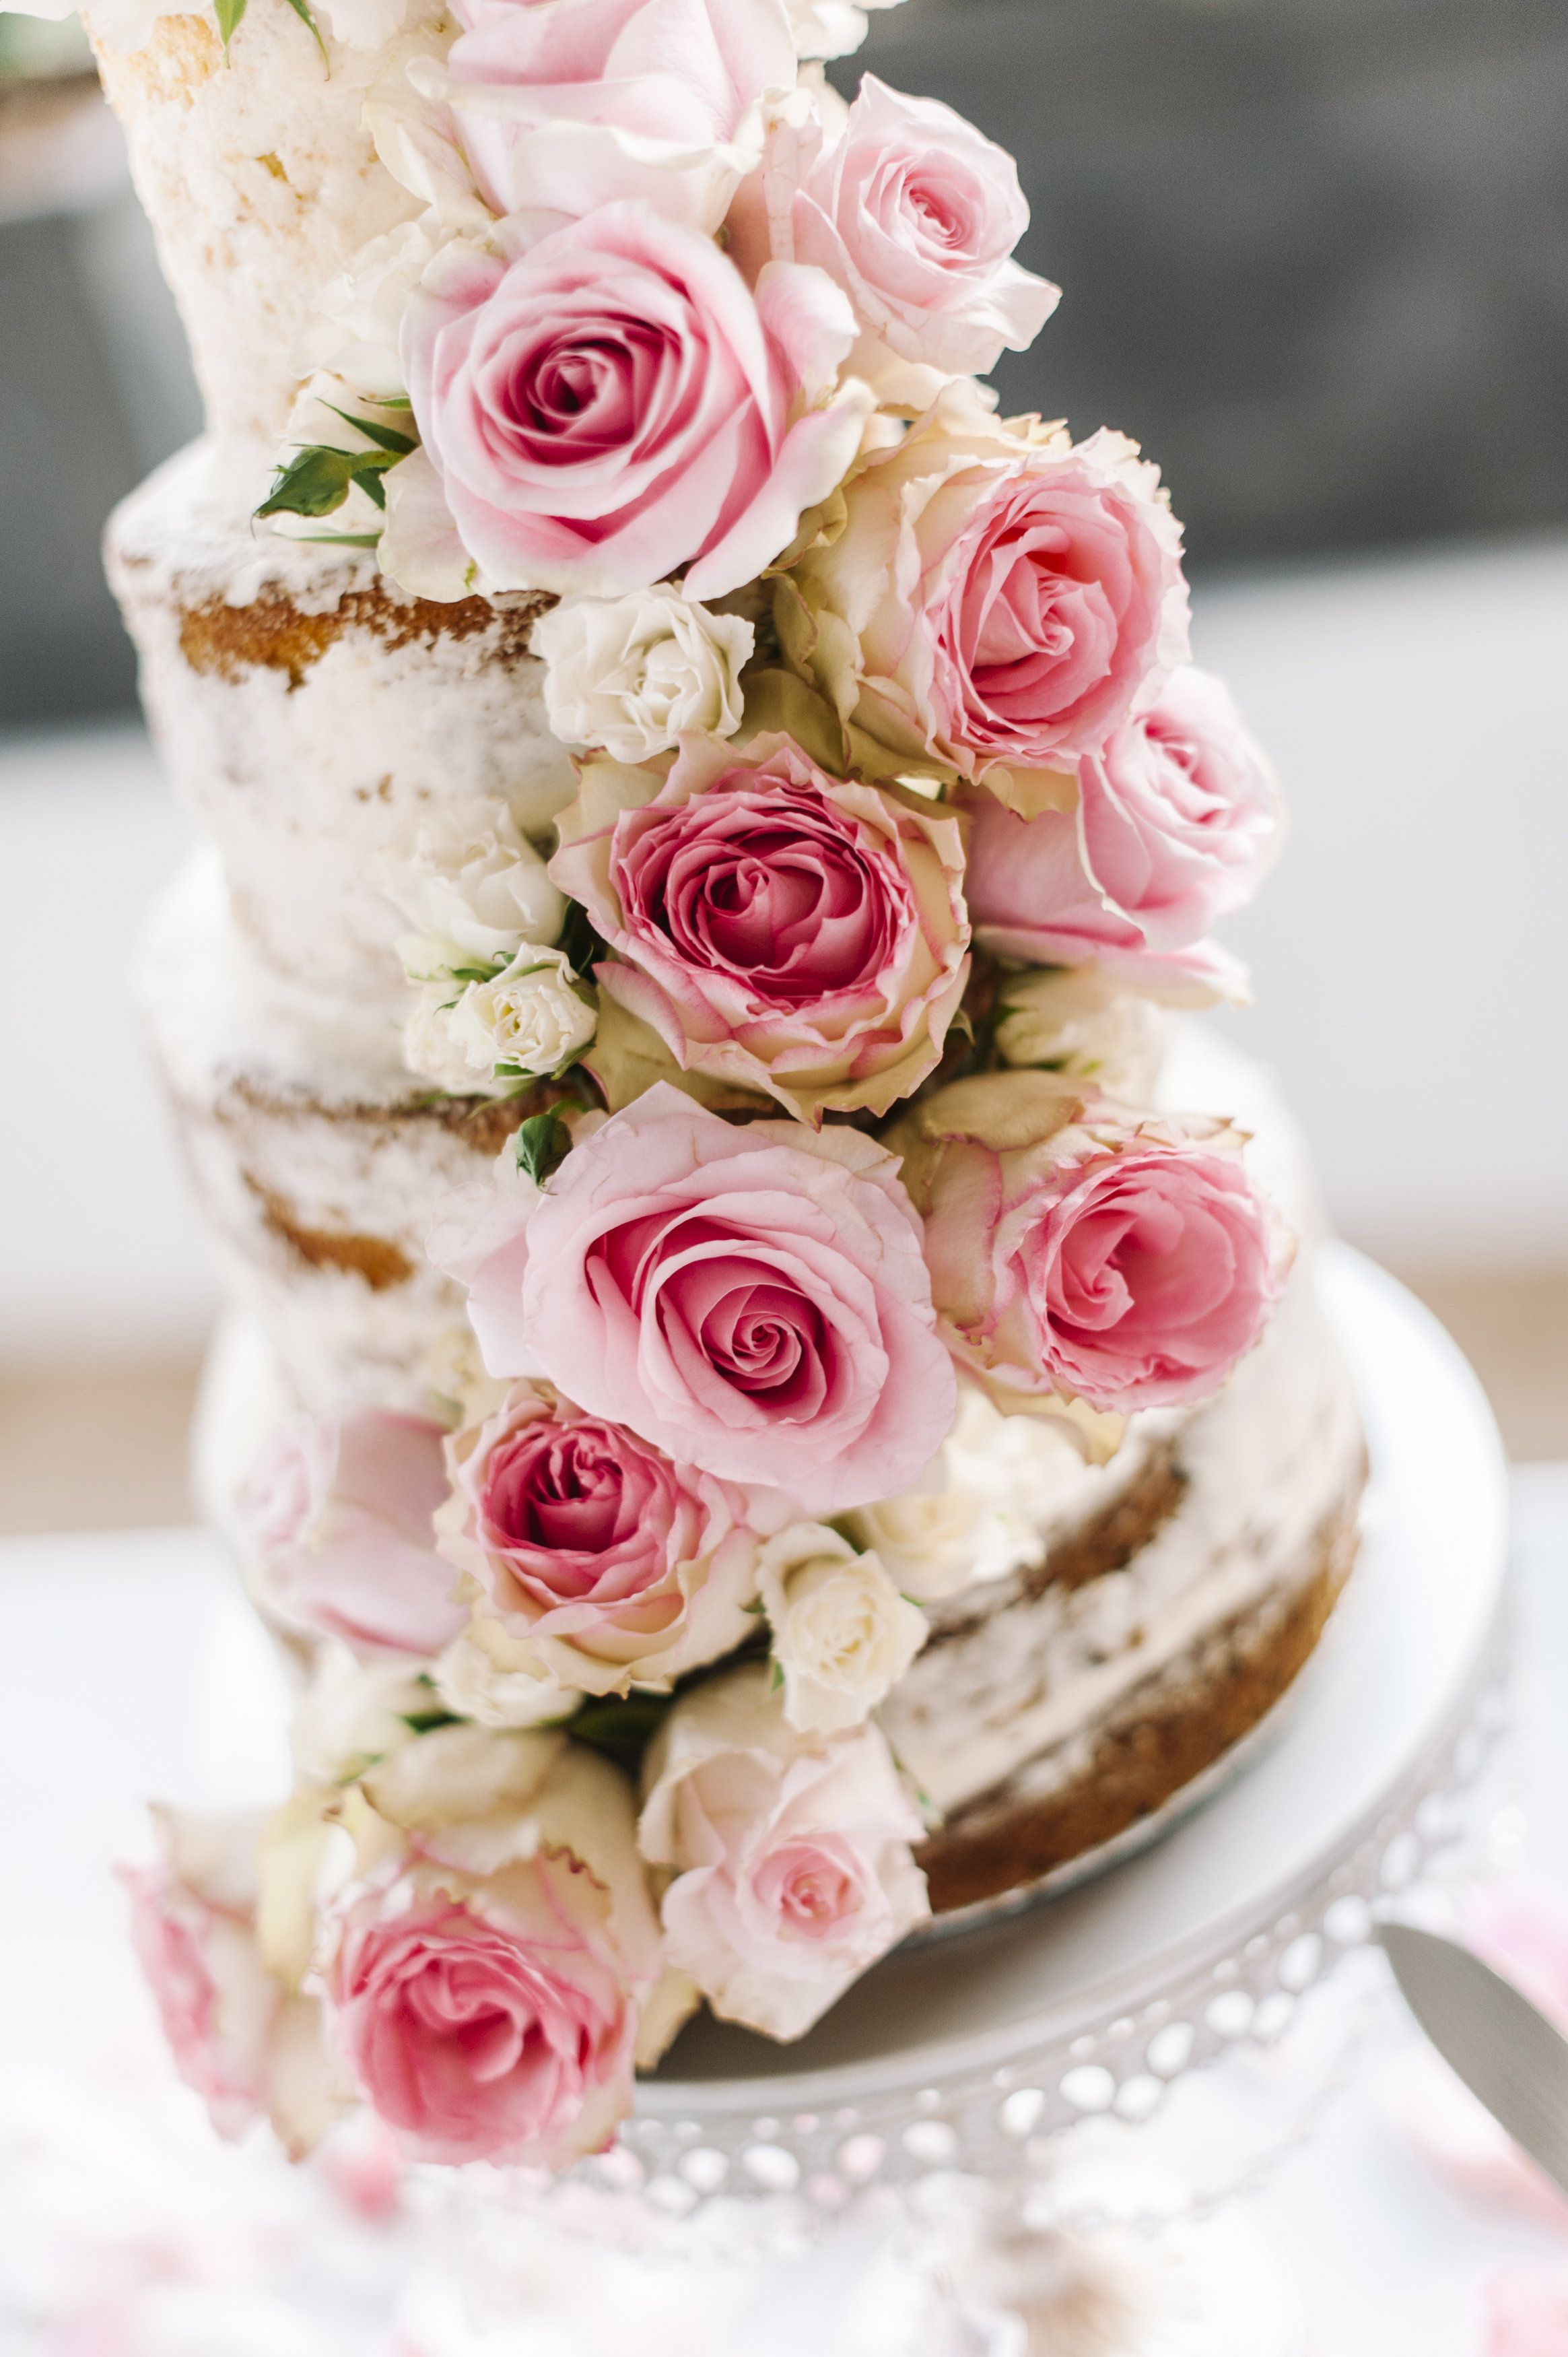 Naked cake roses | Beautiful edibles | Pinterest | Cake